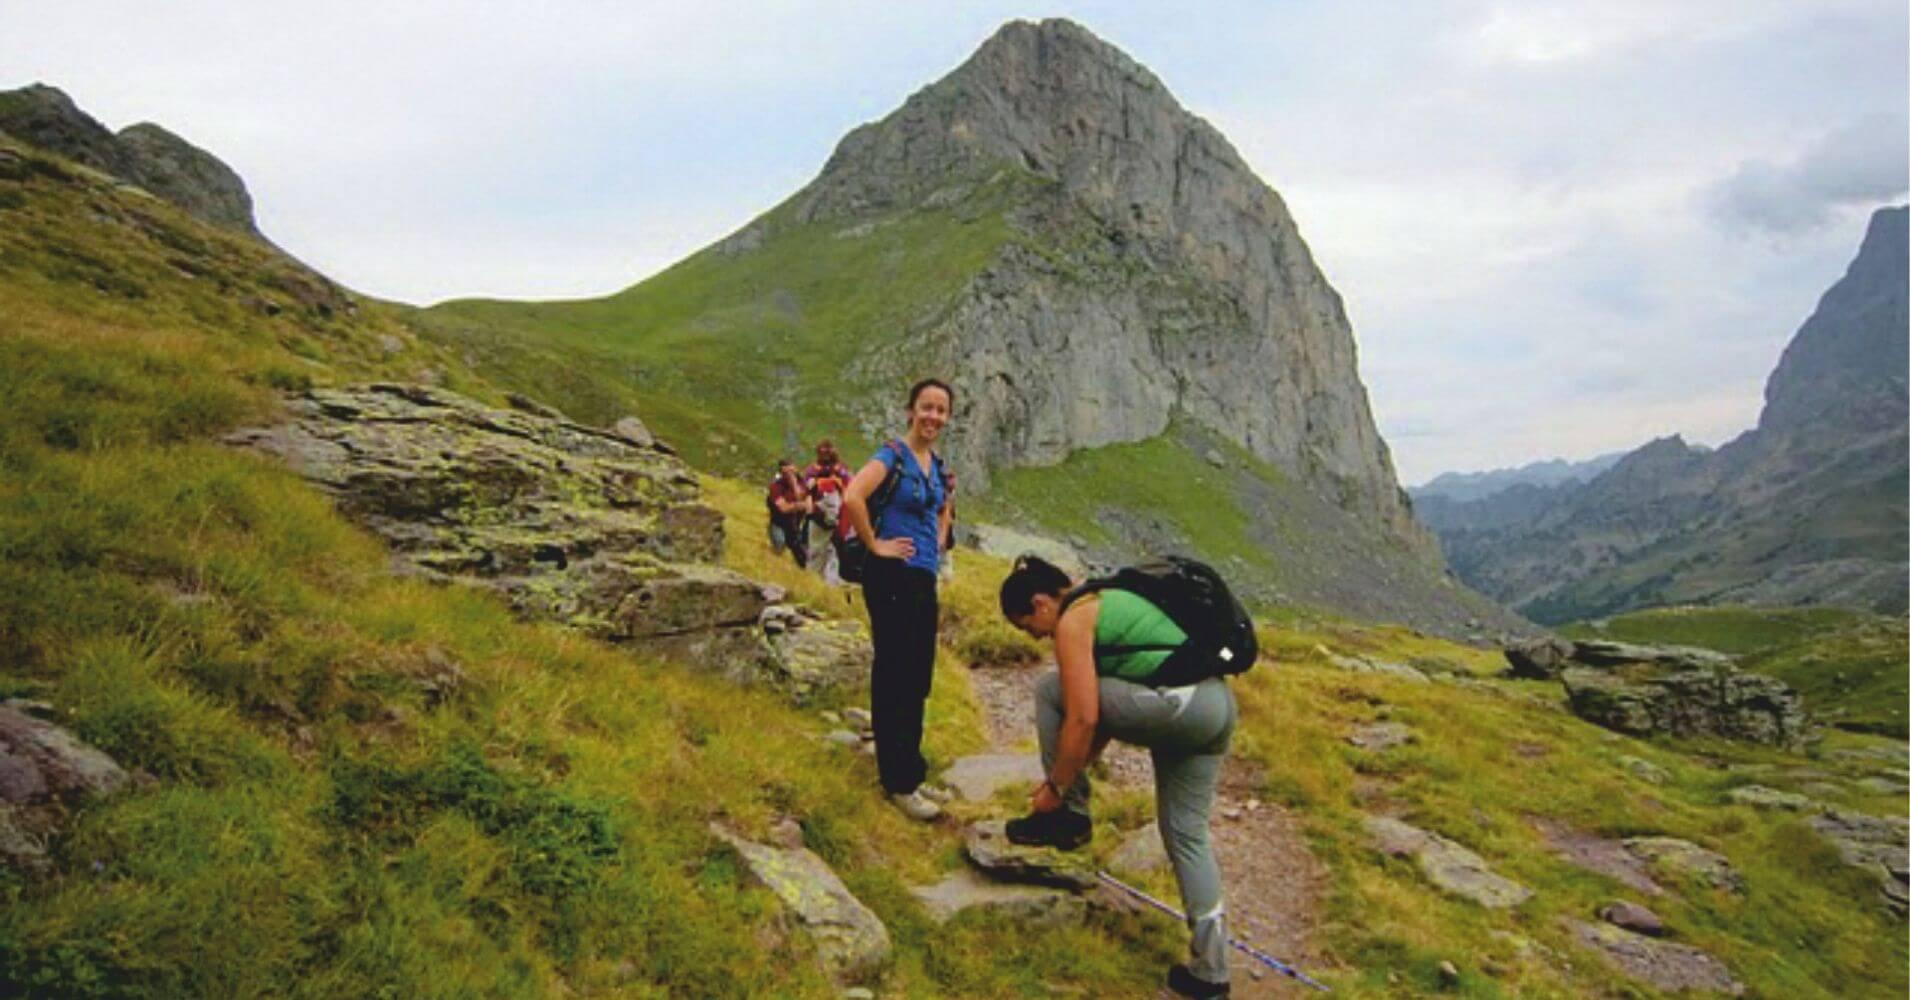 GR10 Parque Nacional de los Pirineos. Etsaut. Nueva Aquitania. Pirineos Atlánticos. Francia.